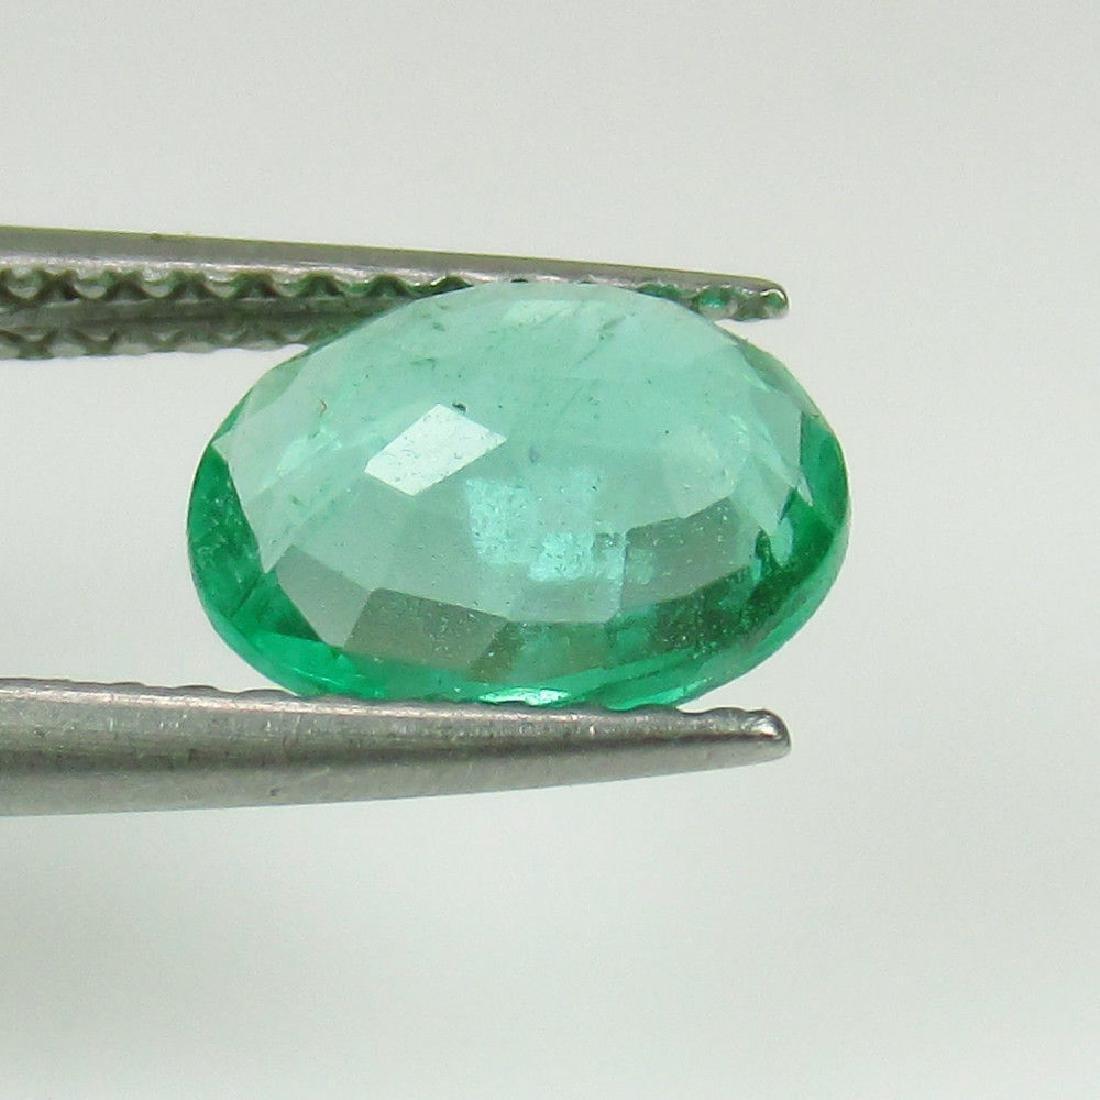 1.23 Ct Genuine Loose Zambian Emerald Nice Oval cut Top - 4